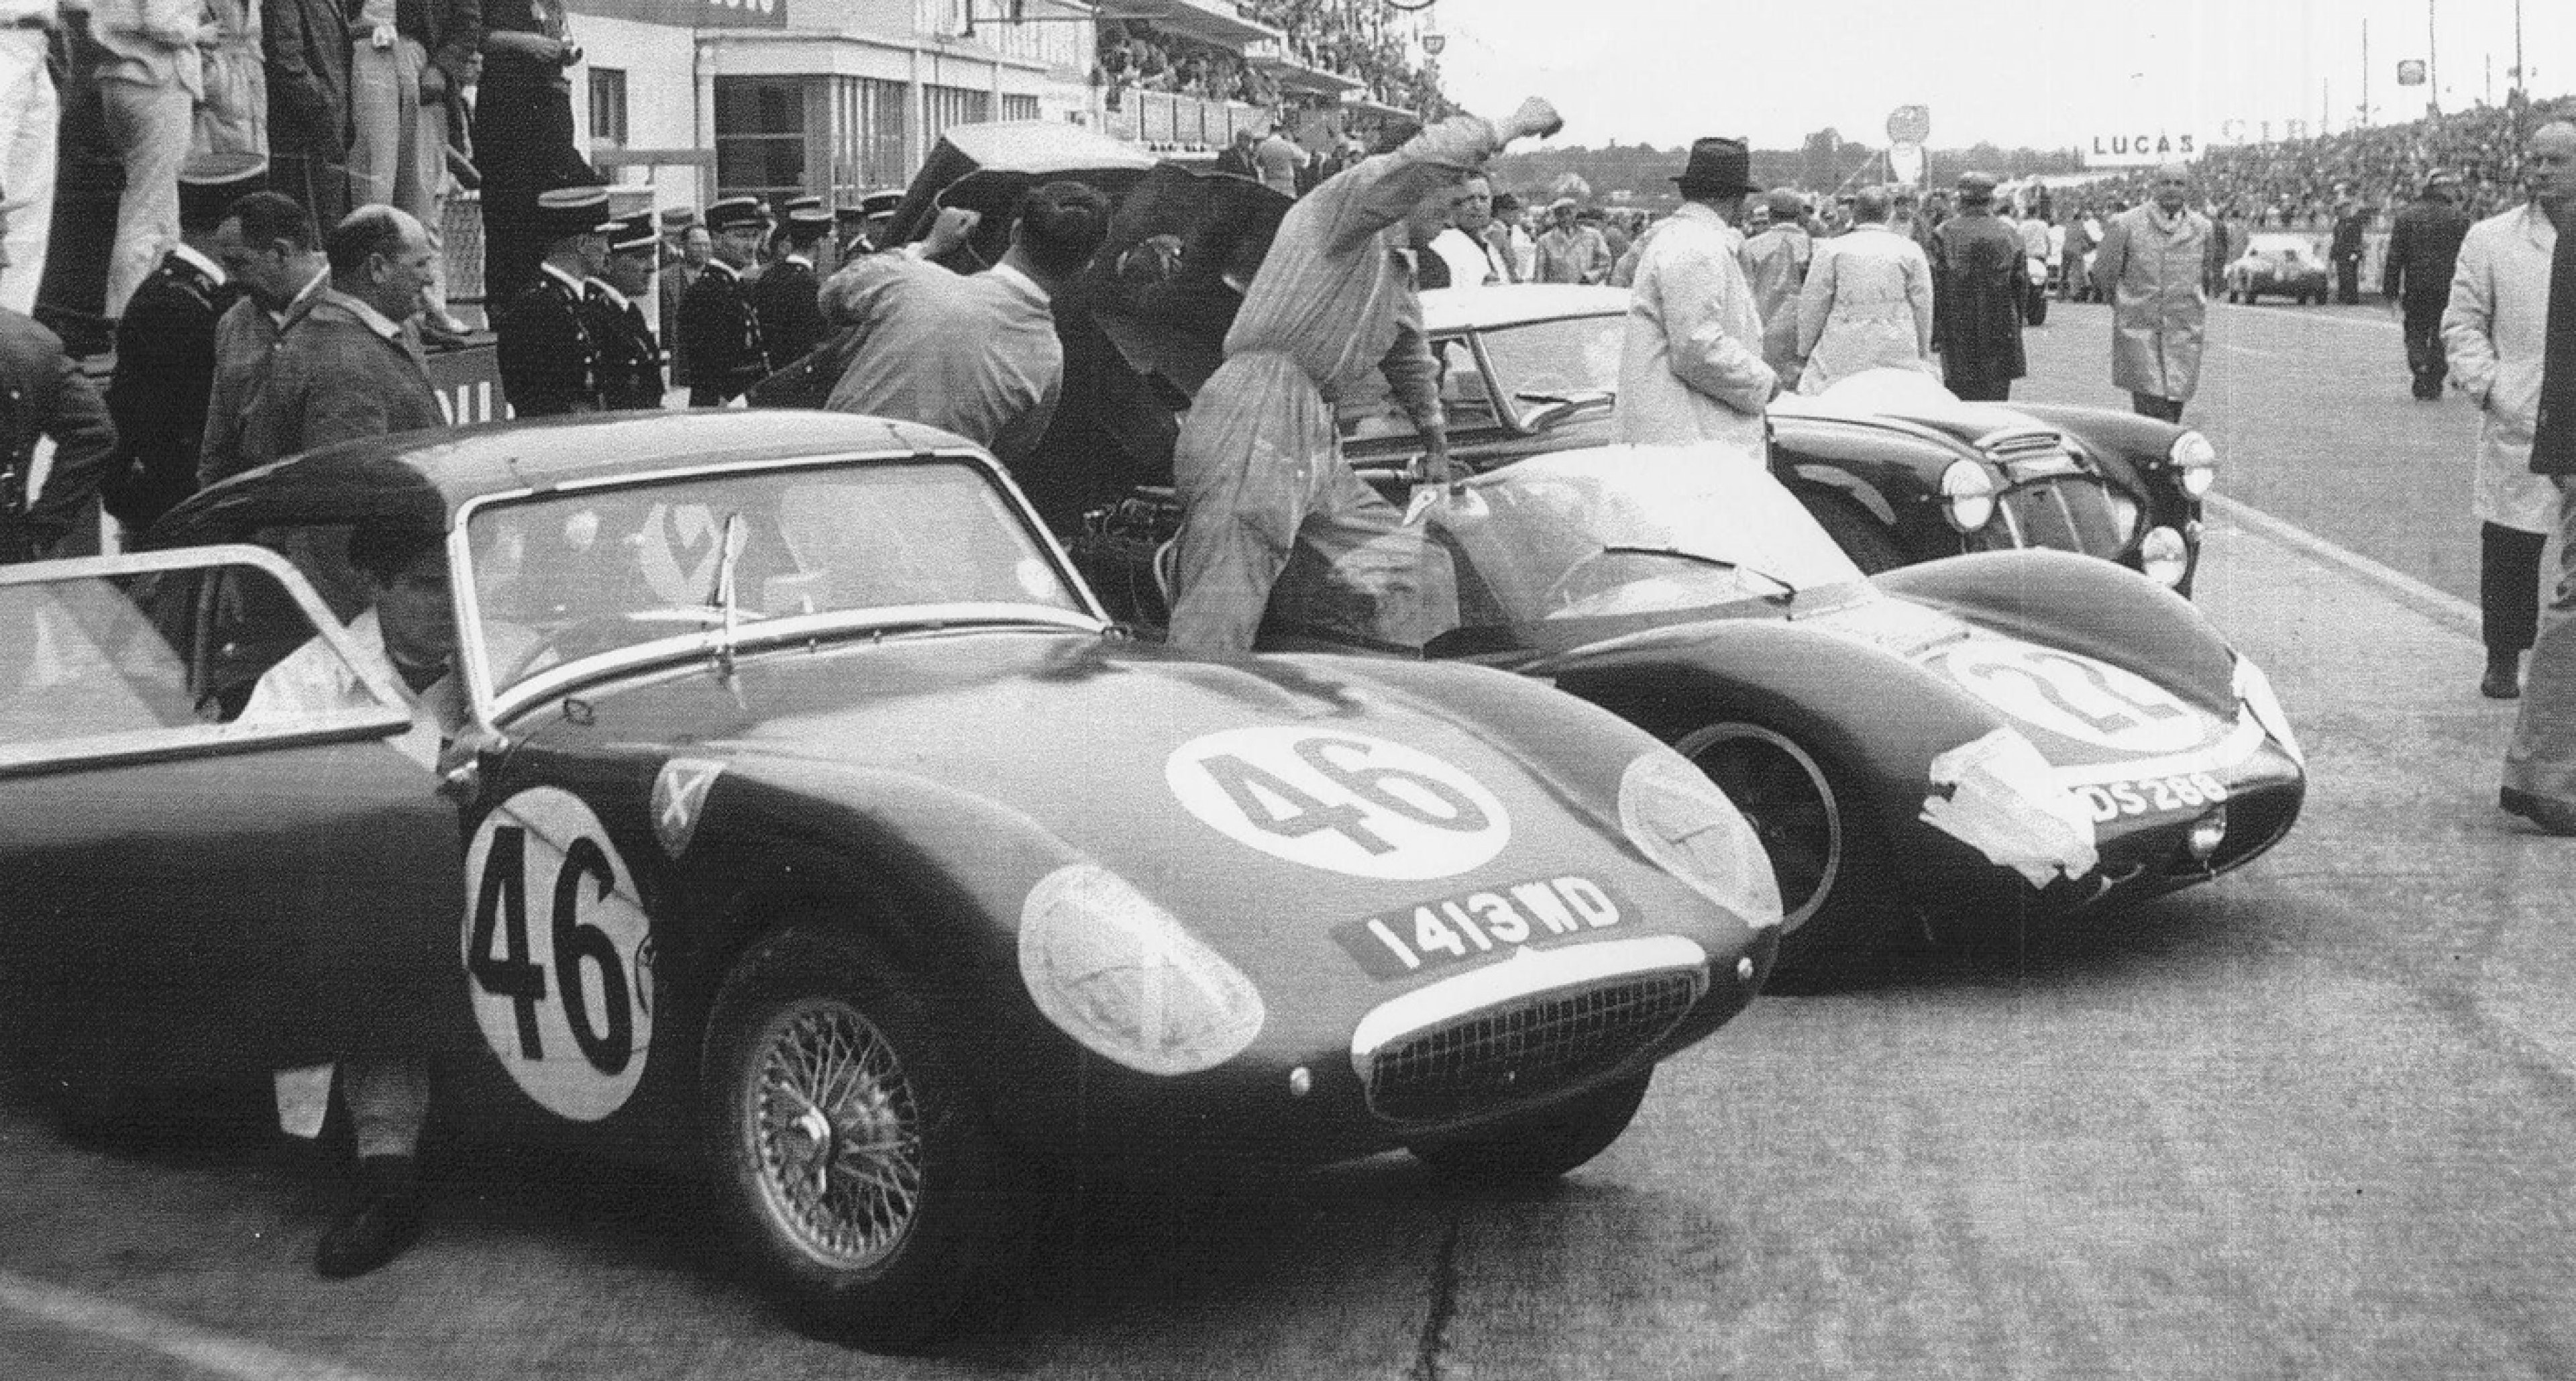 1961 Austin-Healey 'Sebring' Sprite